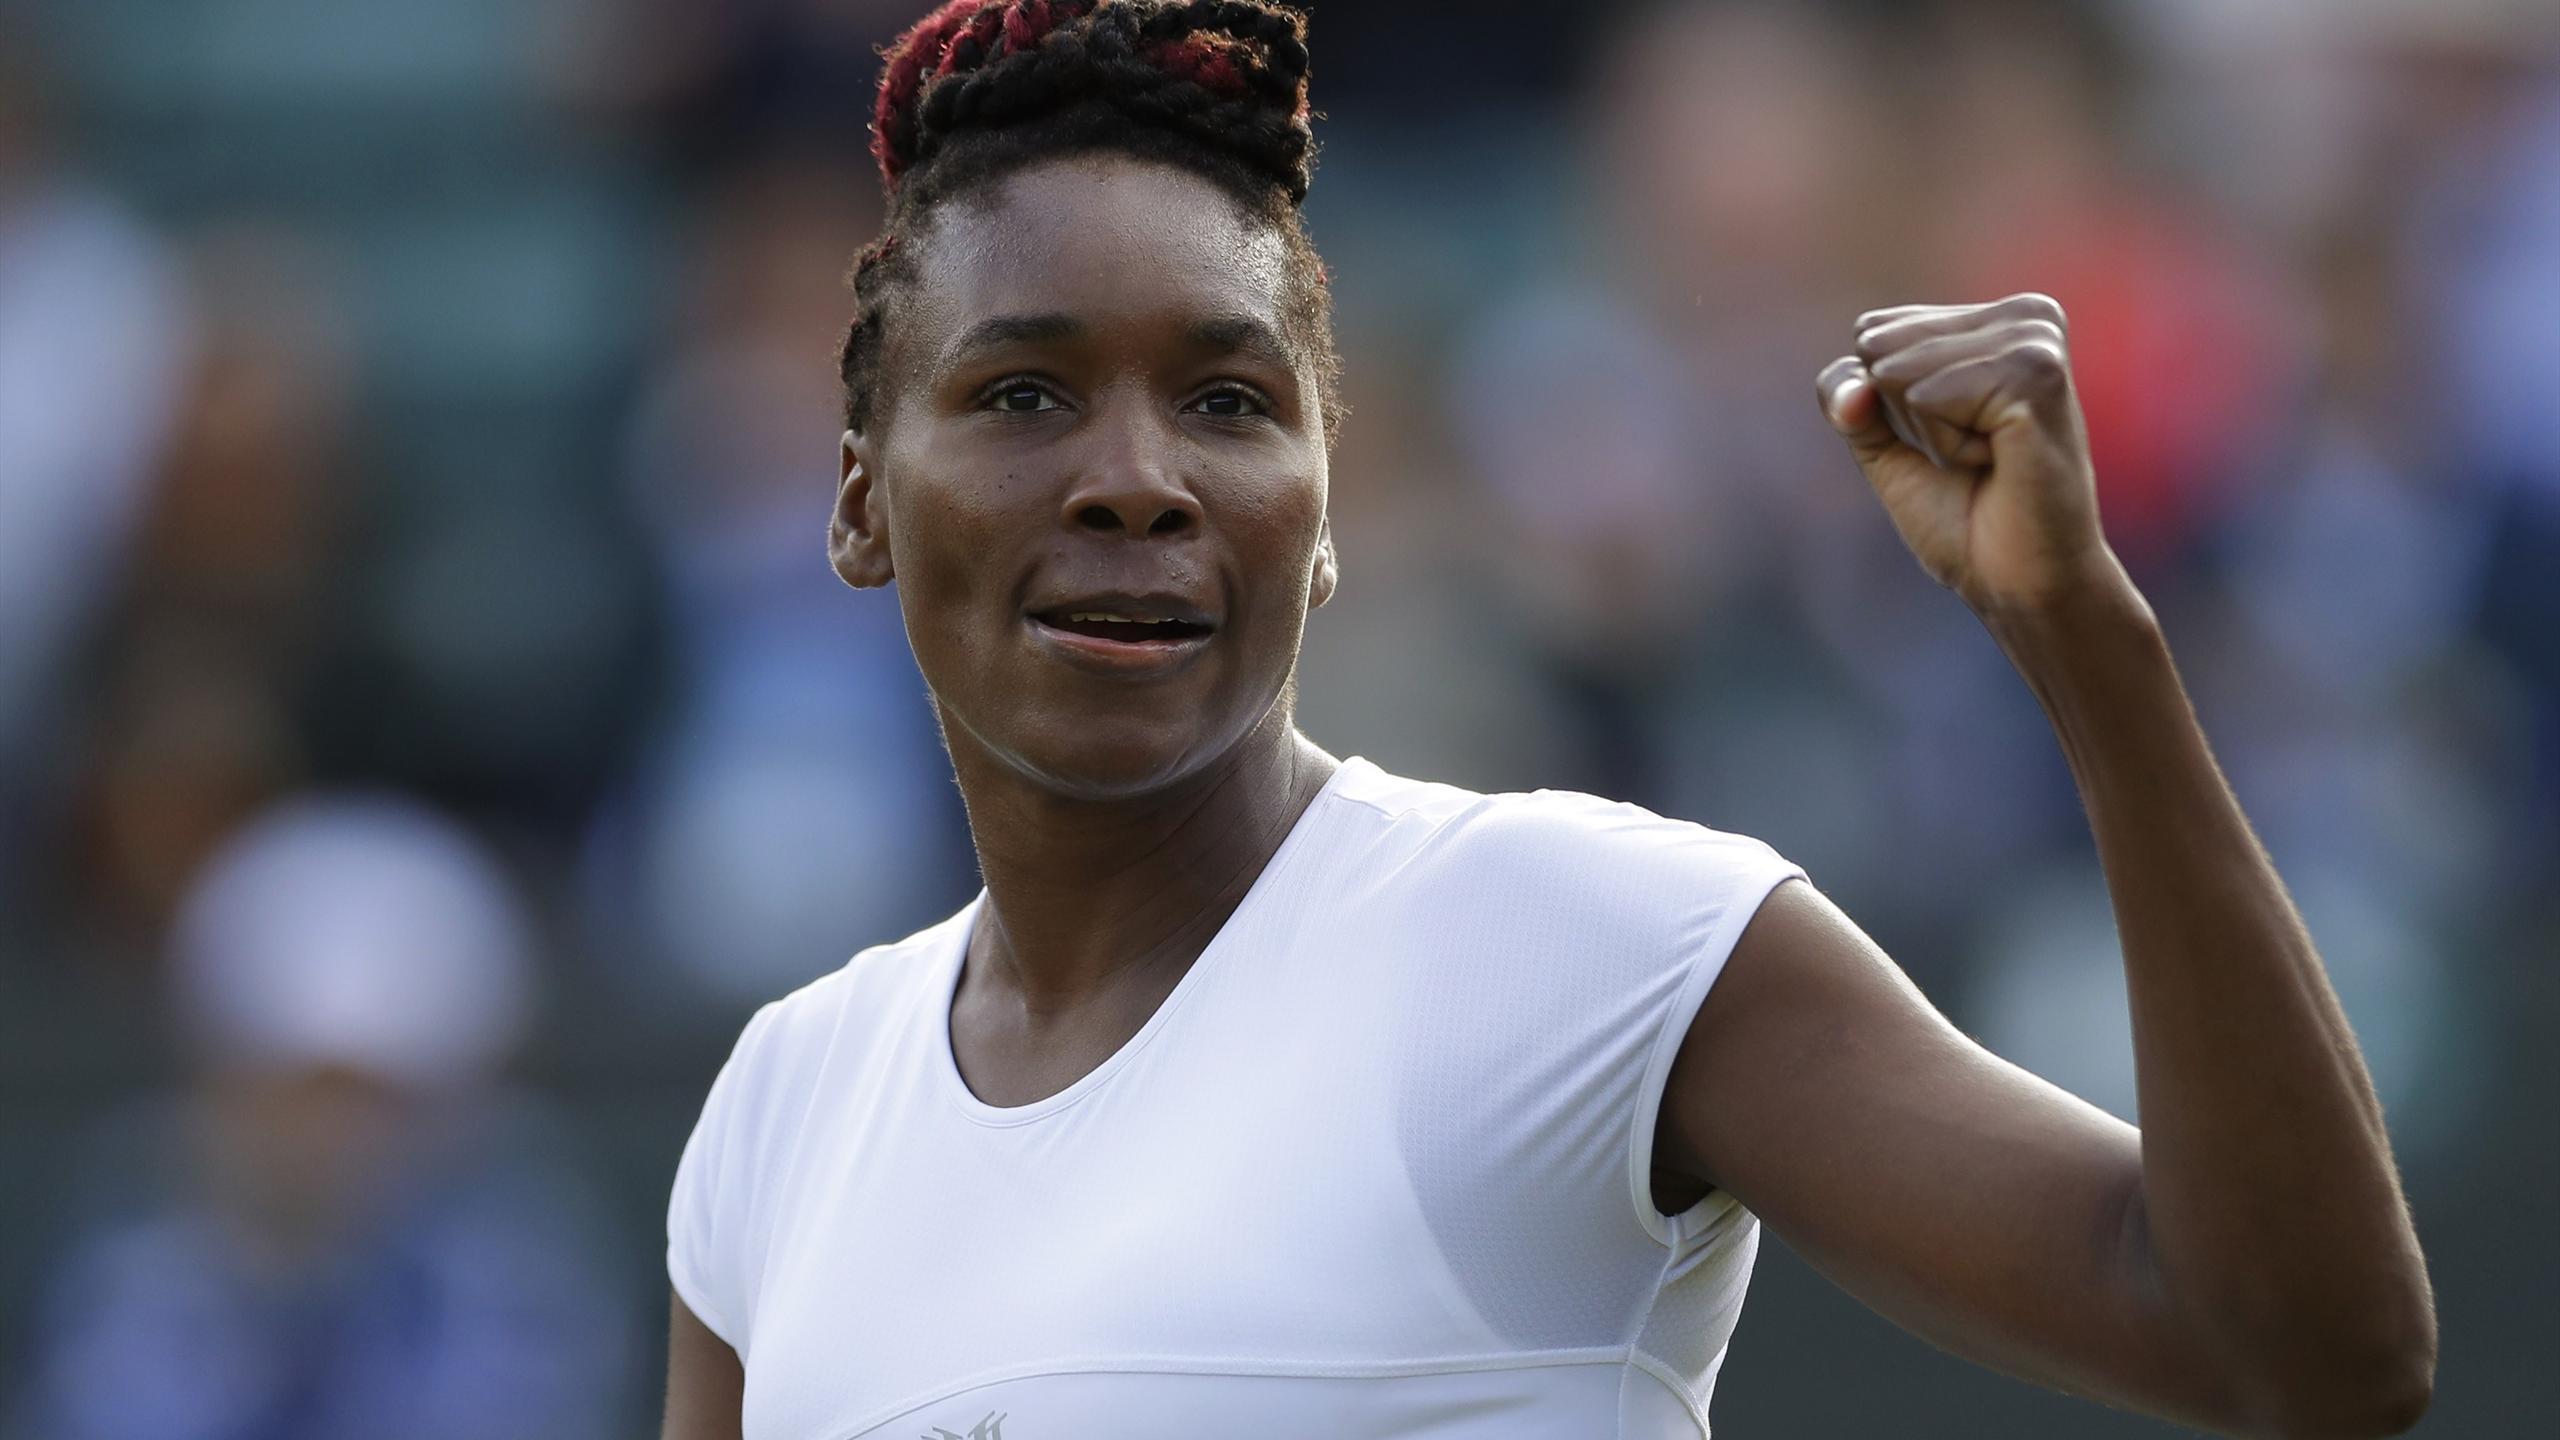 Venus Williams celebrates winning her match against Russia's Daria Kasatkina.